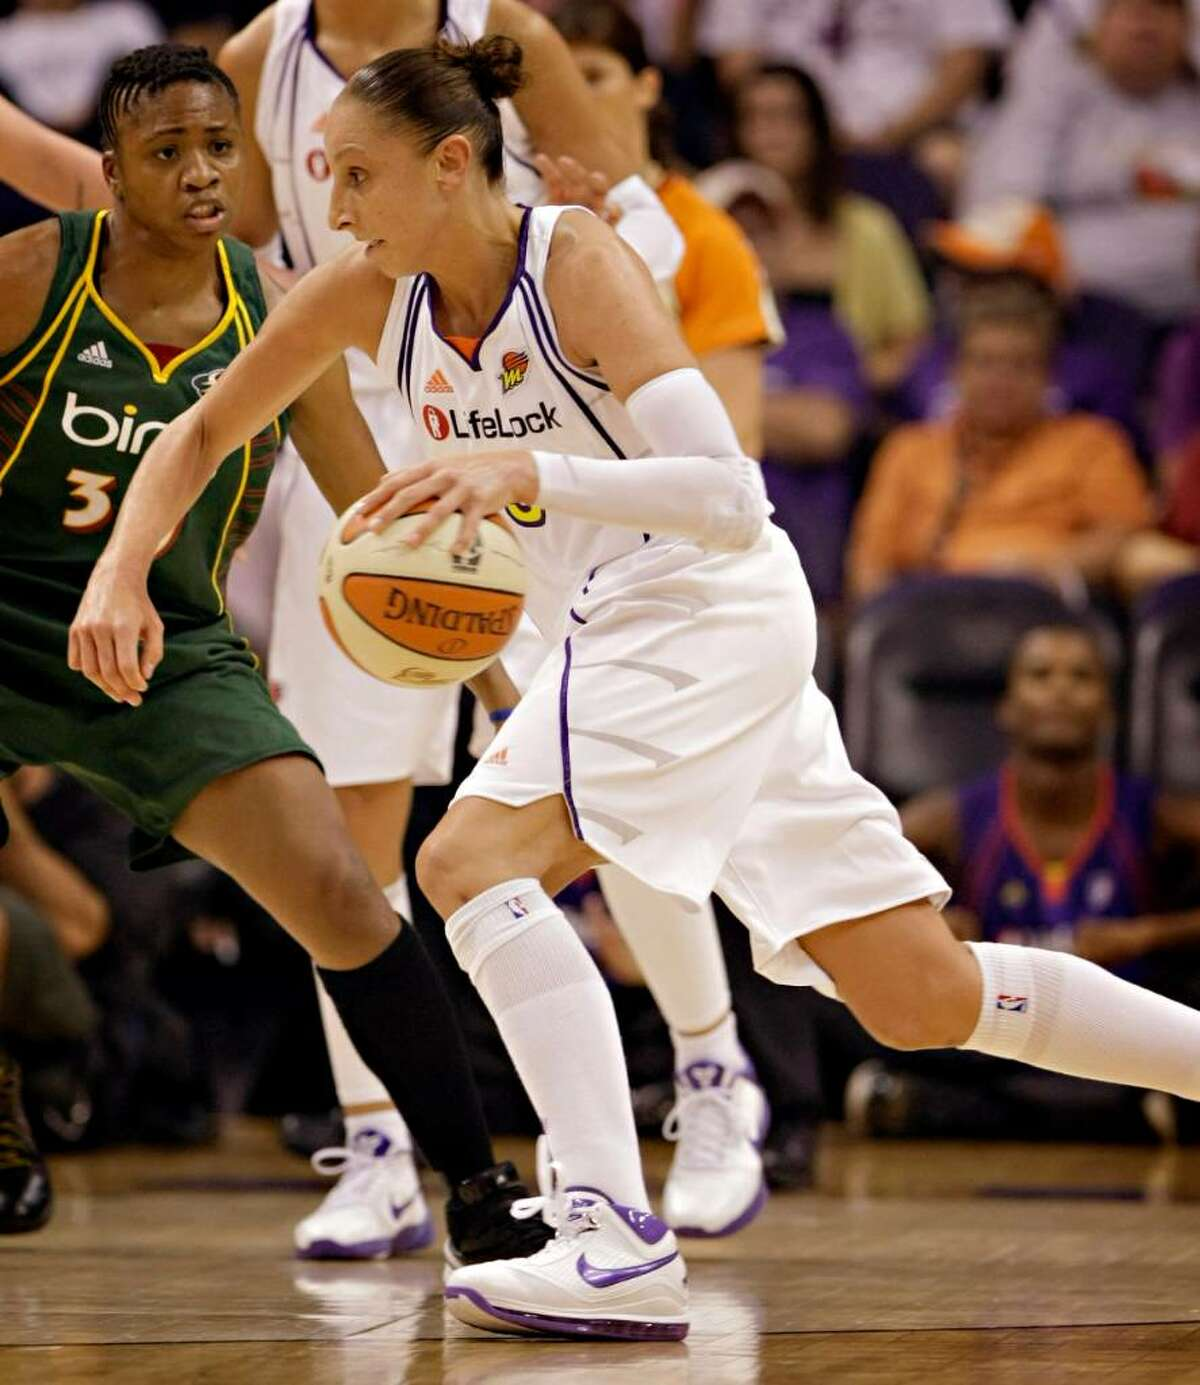 Phoenix Mercury guard Diana Taurasi drives past Seattle Storm guard Tanisha Wright during the second quarter of a WNBA basketball game Wednesday, July 14, 2010, in Phoenix. (AP Photo/Matt York)